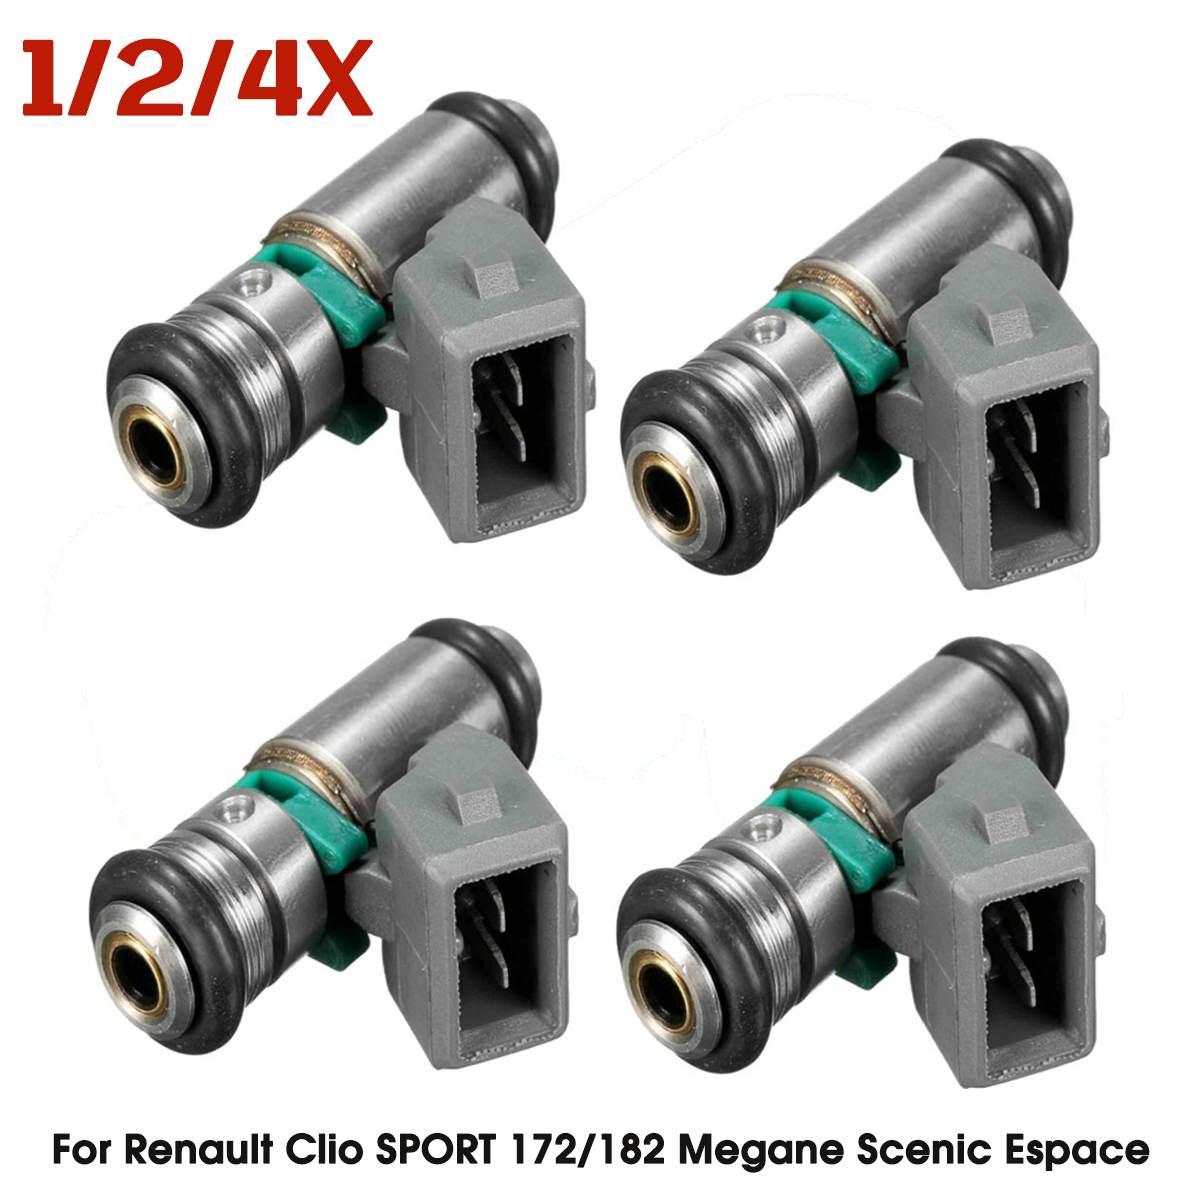 Petrol Fuel Injector IWP042 8200028797 8200207049 for Renault Clio SPORT 172 182 Megane Scenic Espace Laguna TLAGUNA TESPACE